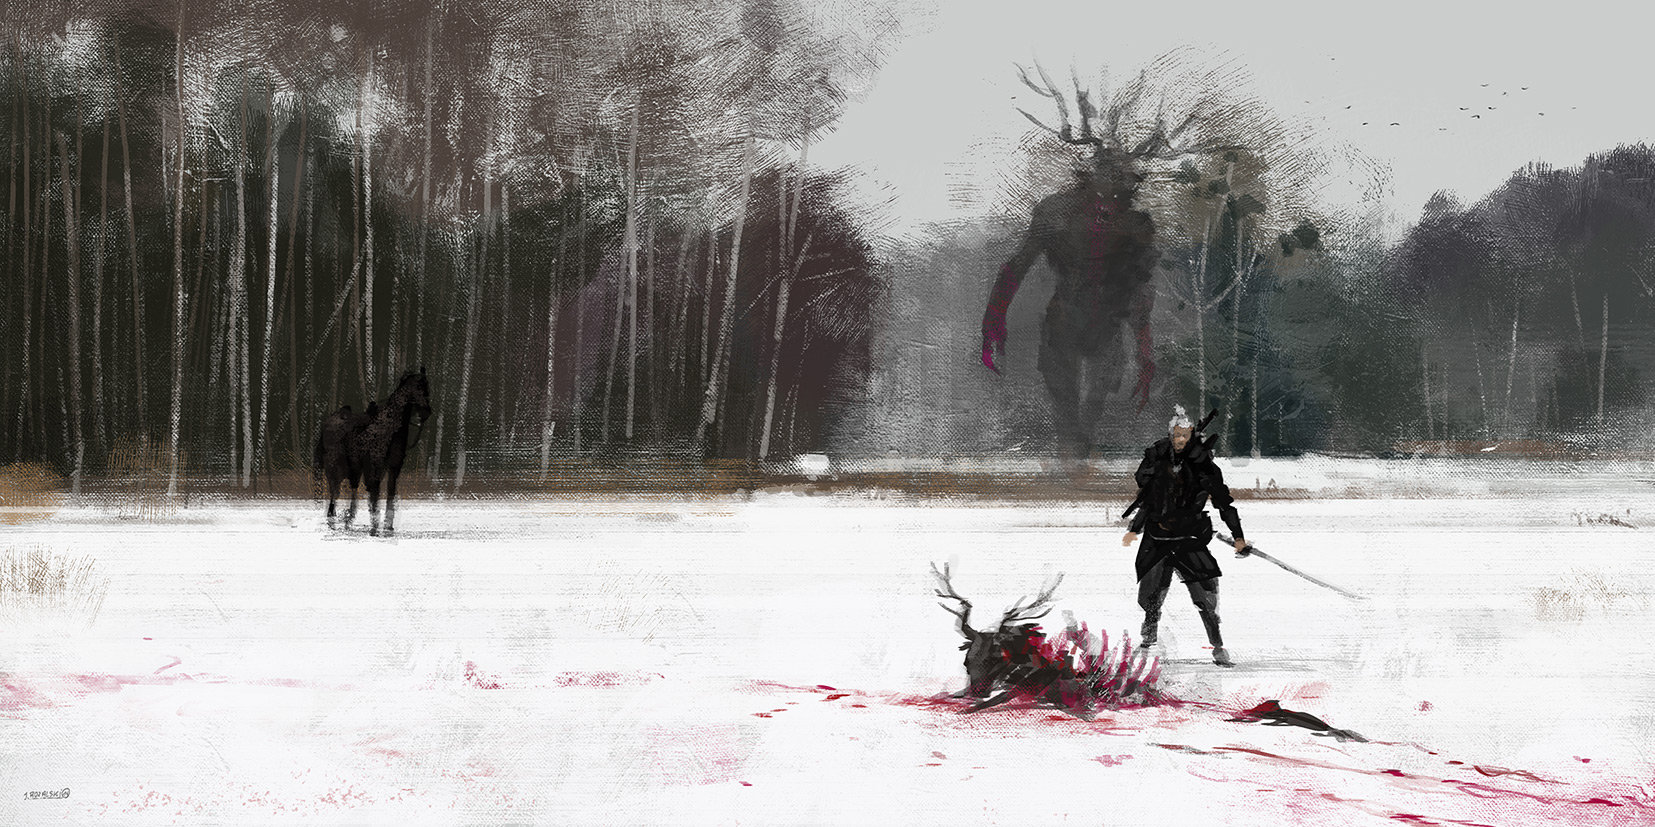 leszy - Witcher 3: Wild Hunt, the